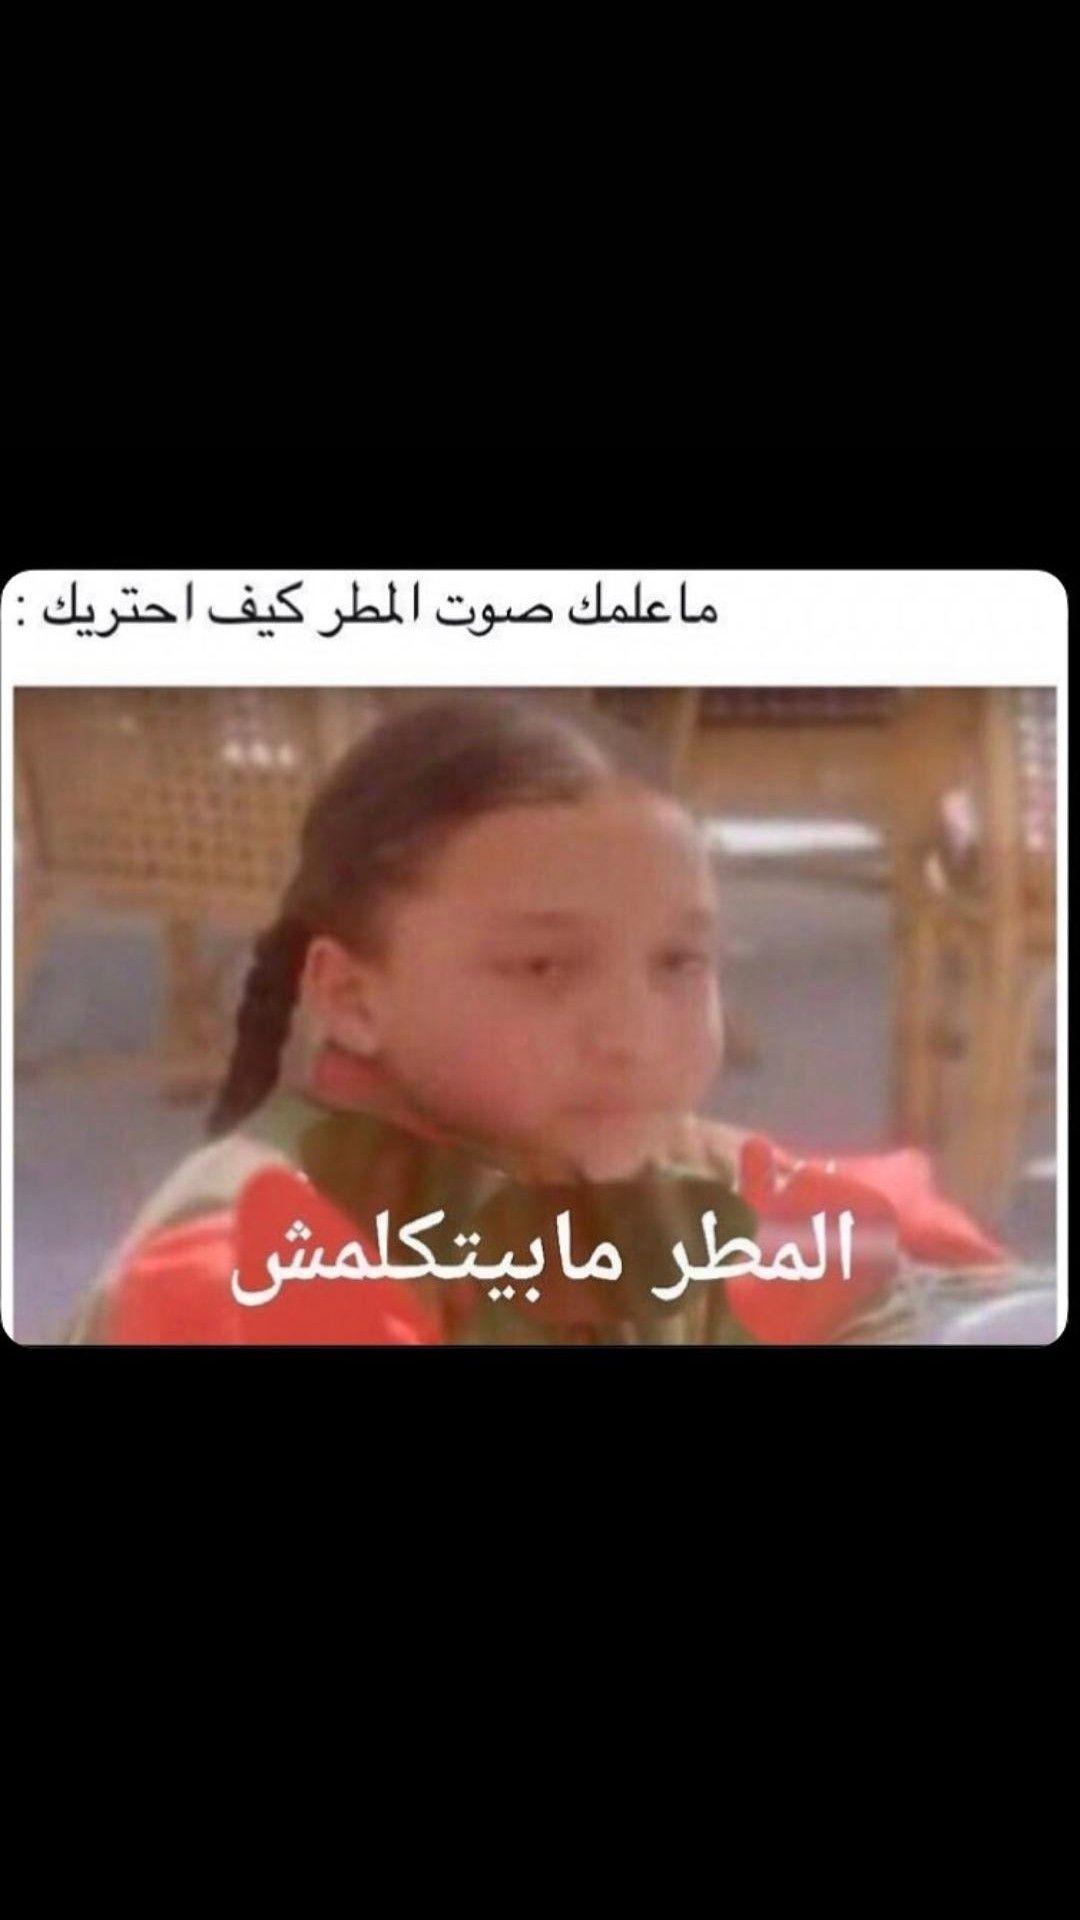 Pin By Jojo On استهبال Funny School Memes School Memes Funny Quotes